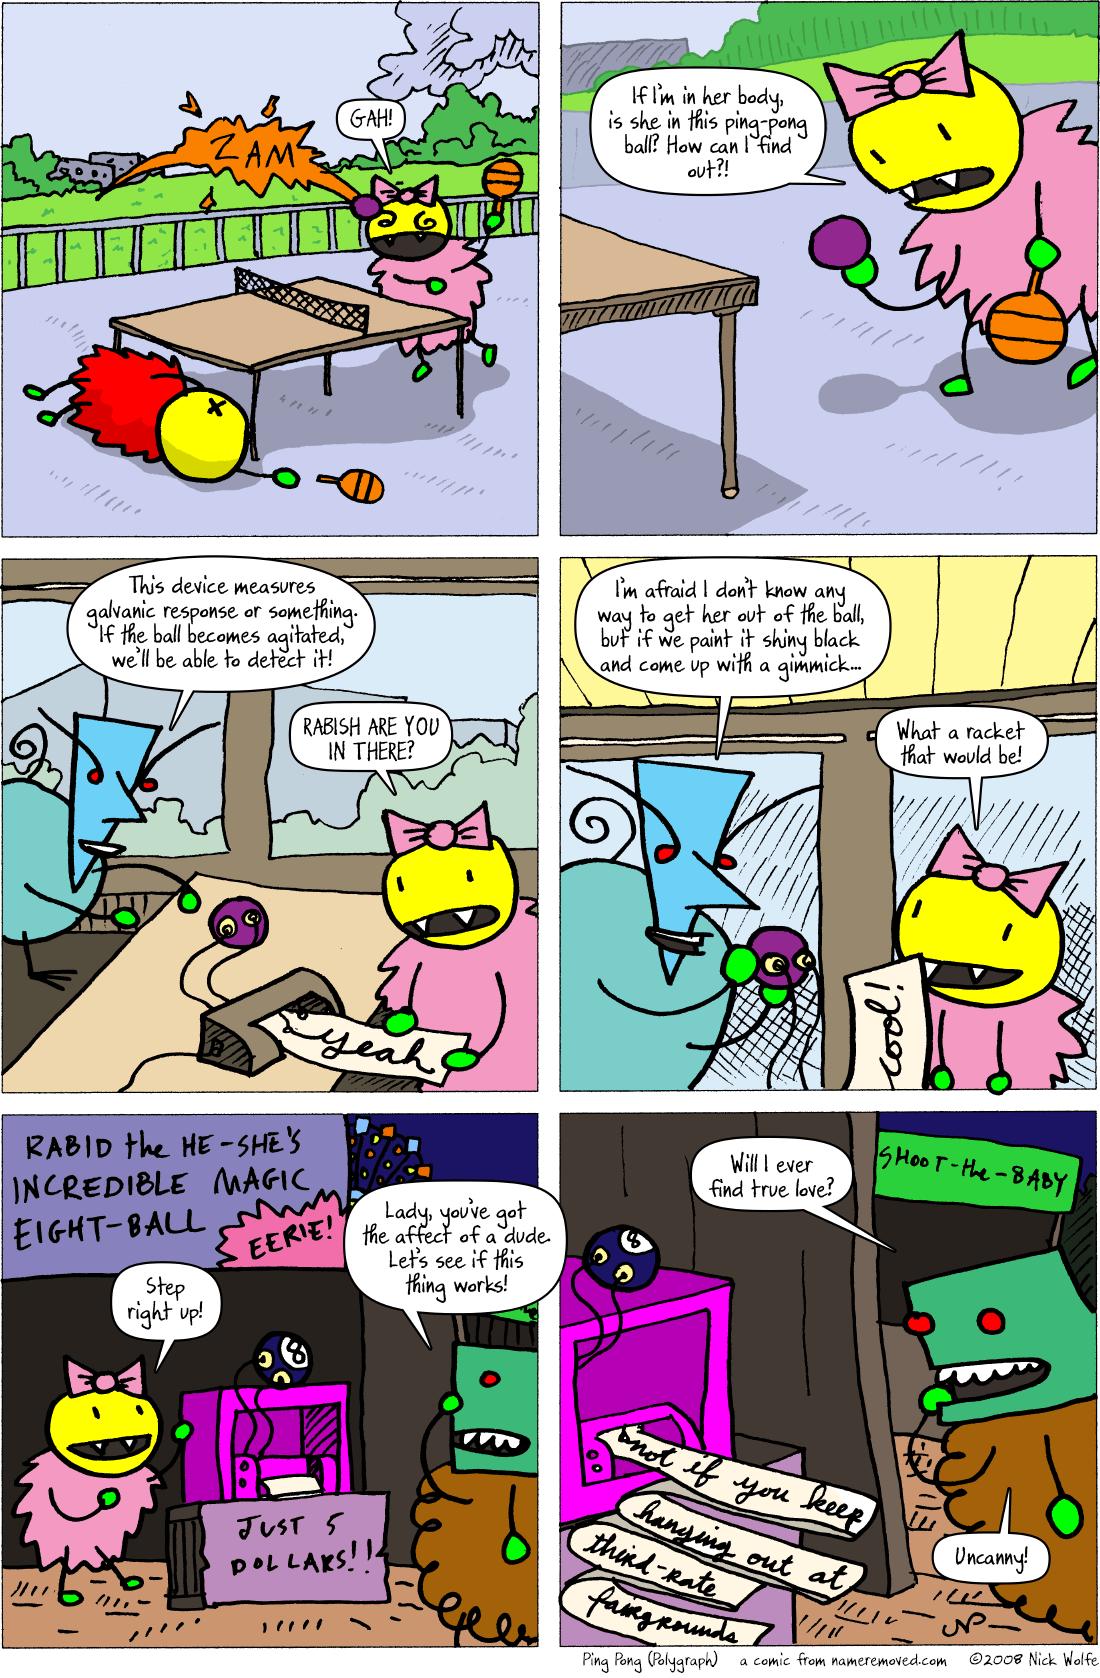 Ping Pong (Polygraph)